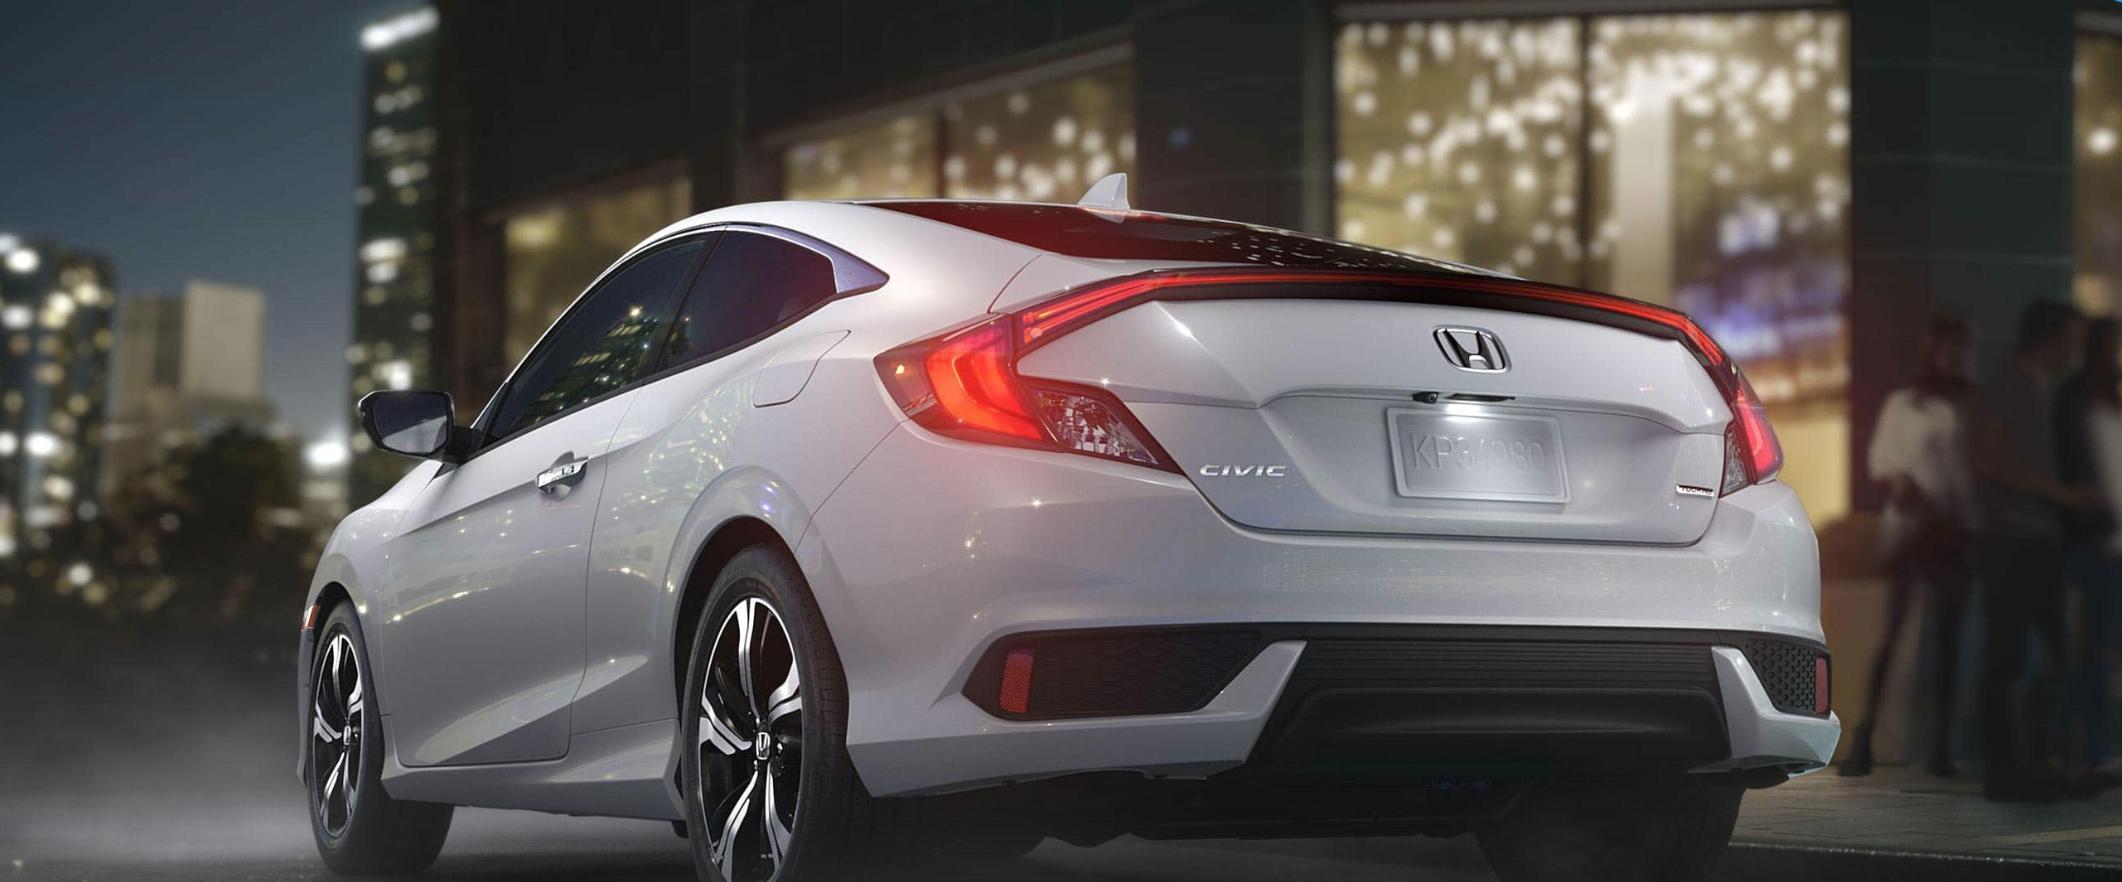 2016 Honda Civic Coupe rear view